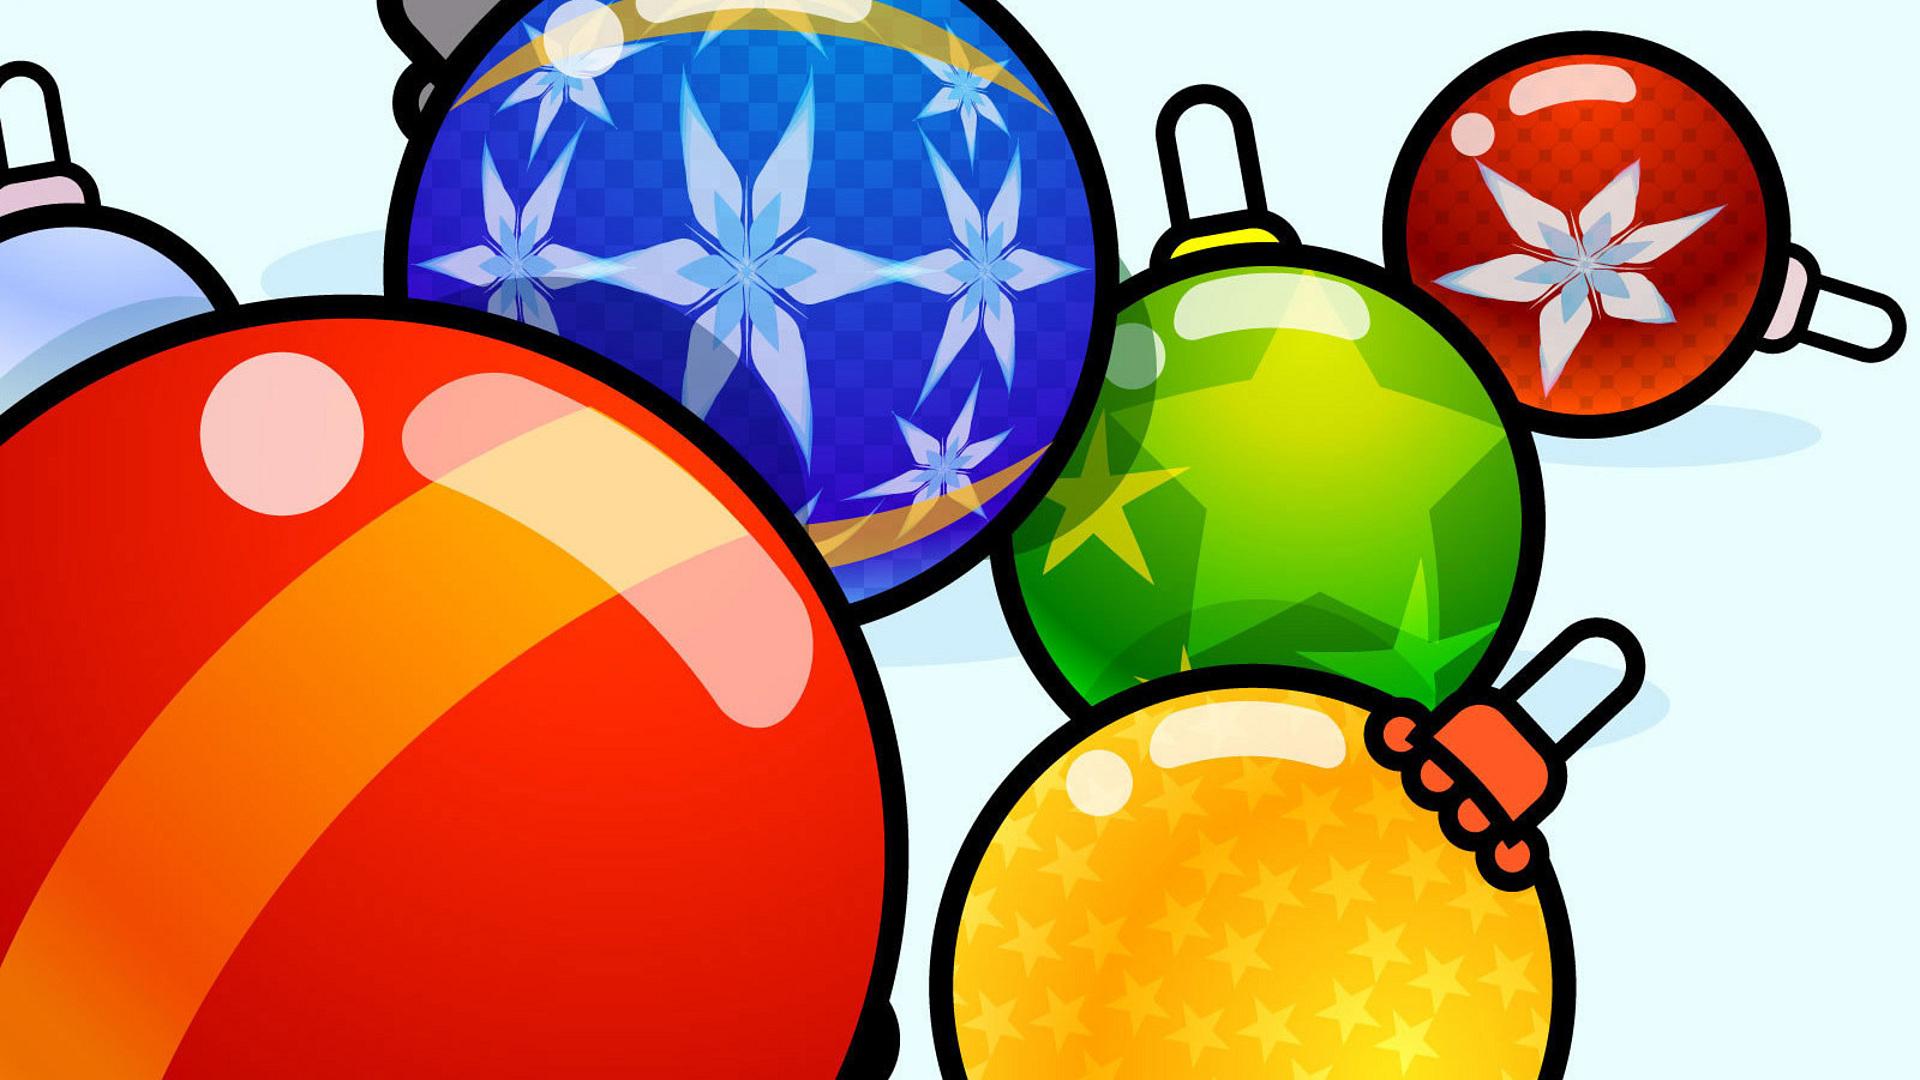 Картинки на тему игры игрушки шарики и бантики